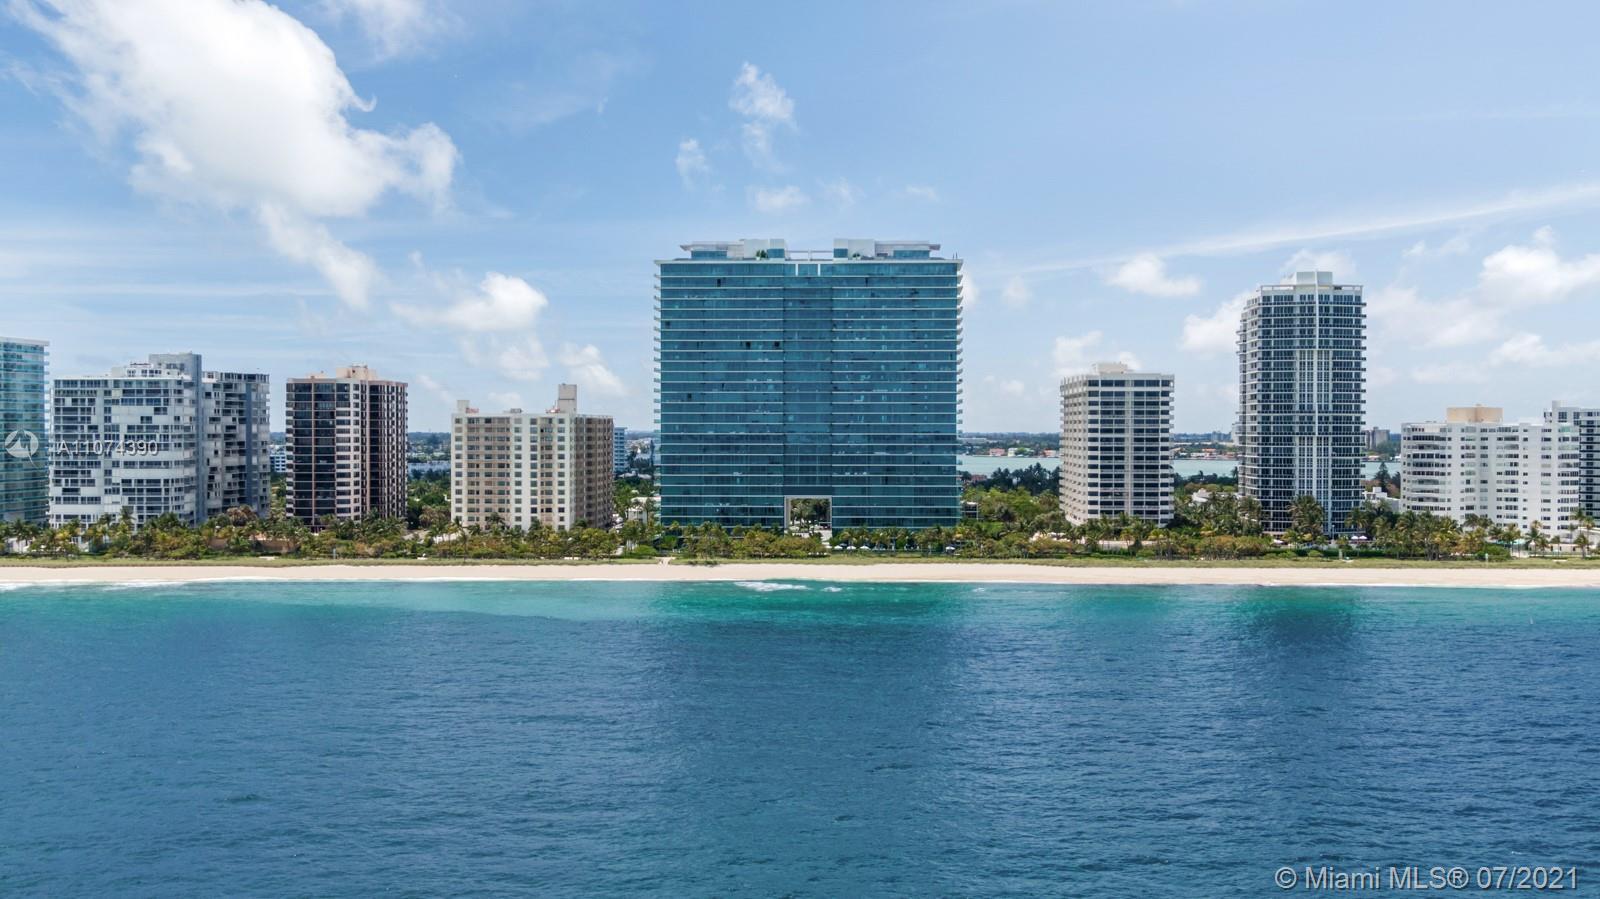 Oceana Bal Harbour #1403 - 10203 Collins Ave #1403, Bal Harbour, FL 33154